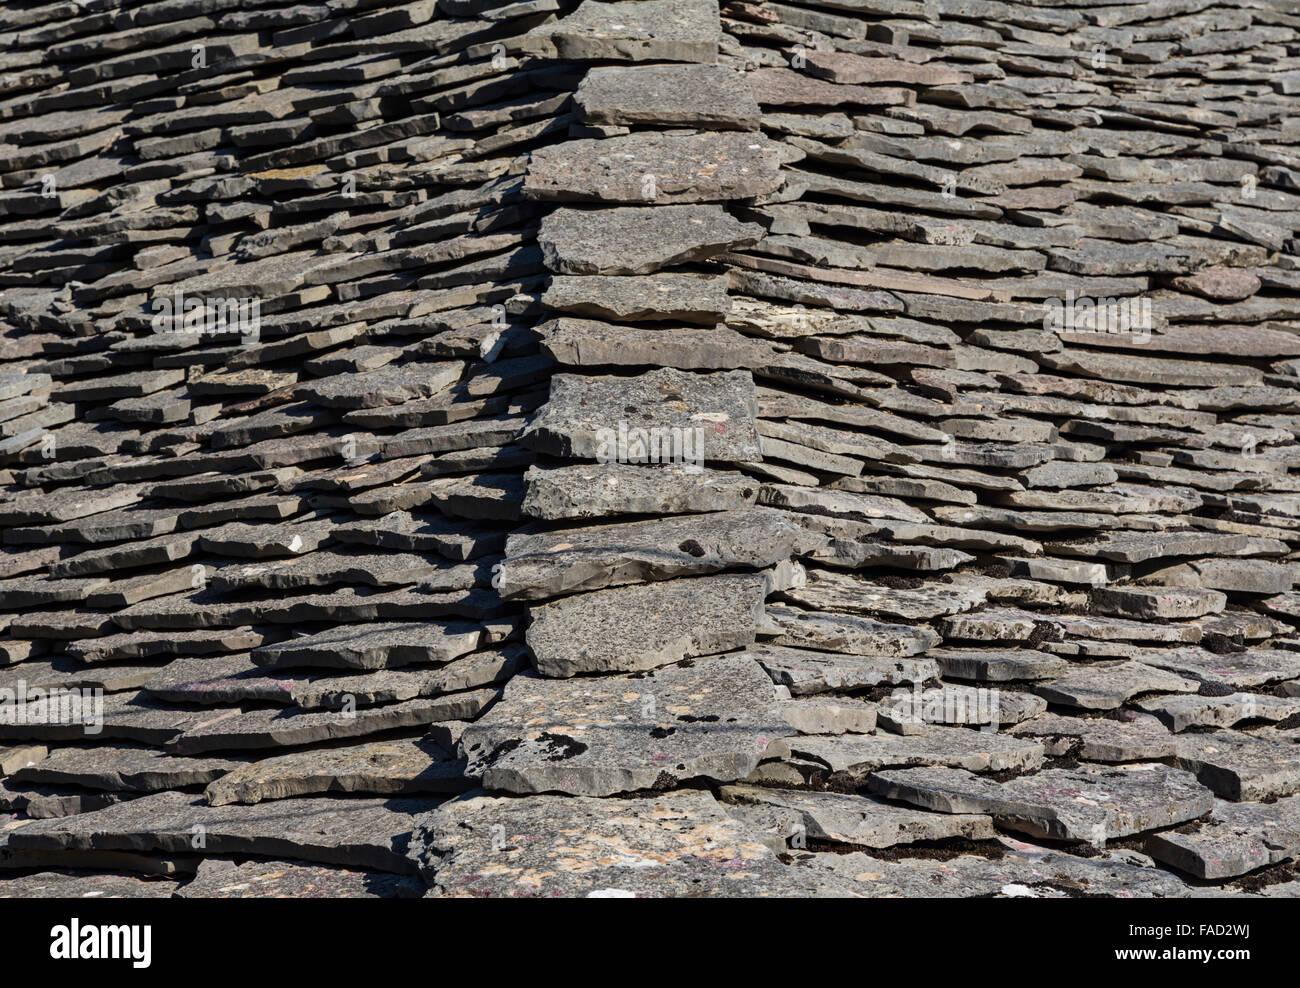 Gjirokastra or Gjirokaster, Albania. Typical stone roofs in the old town.  Gjirokastra is a UNESCO World Heritage - Stock Image